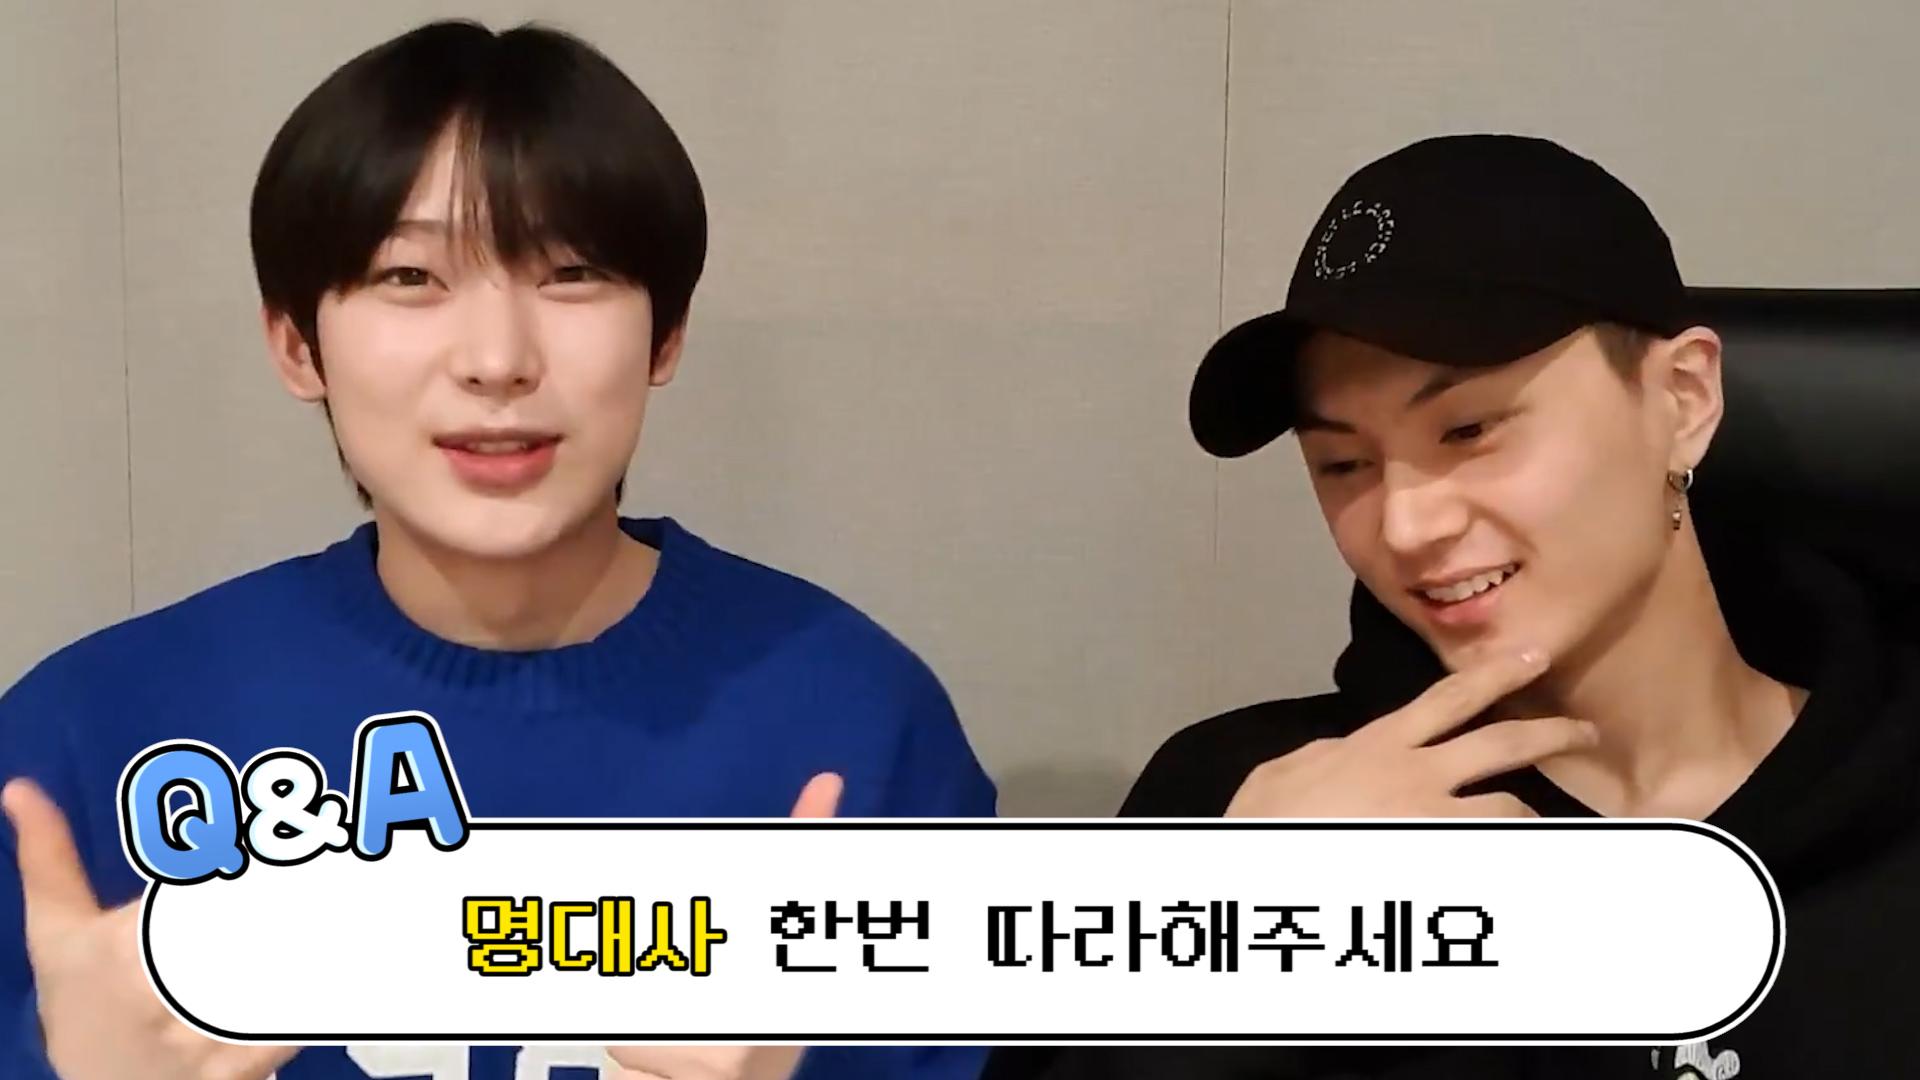 [ENHYPEN] 👤: 이거 보면.. 엔하이픈에 인생 거는 거다? 넵٩(ˊωˋ*) (SUNOO&JAY's Q&A time!)